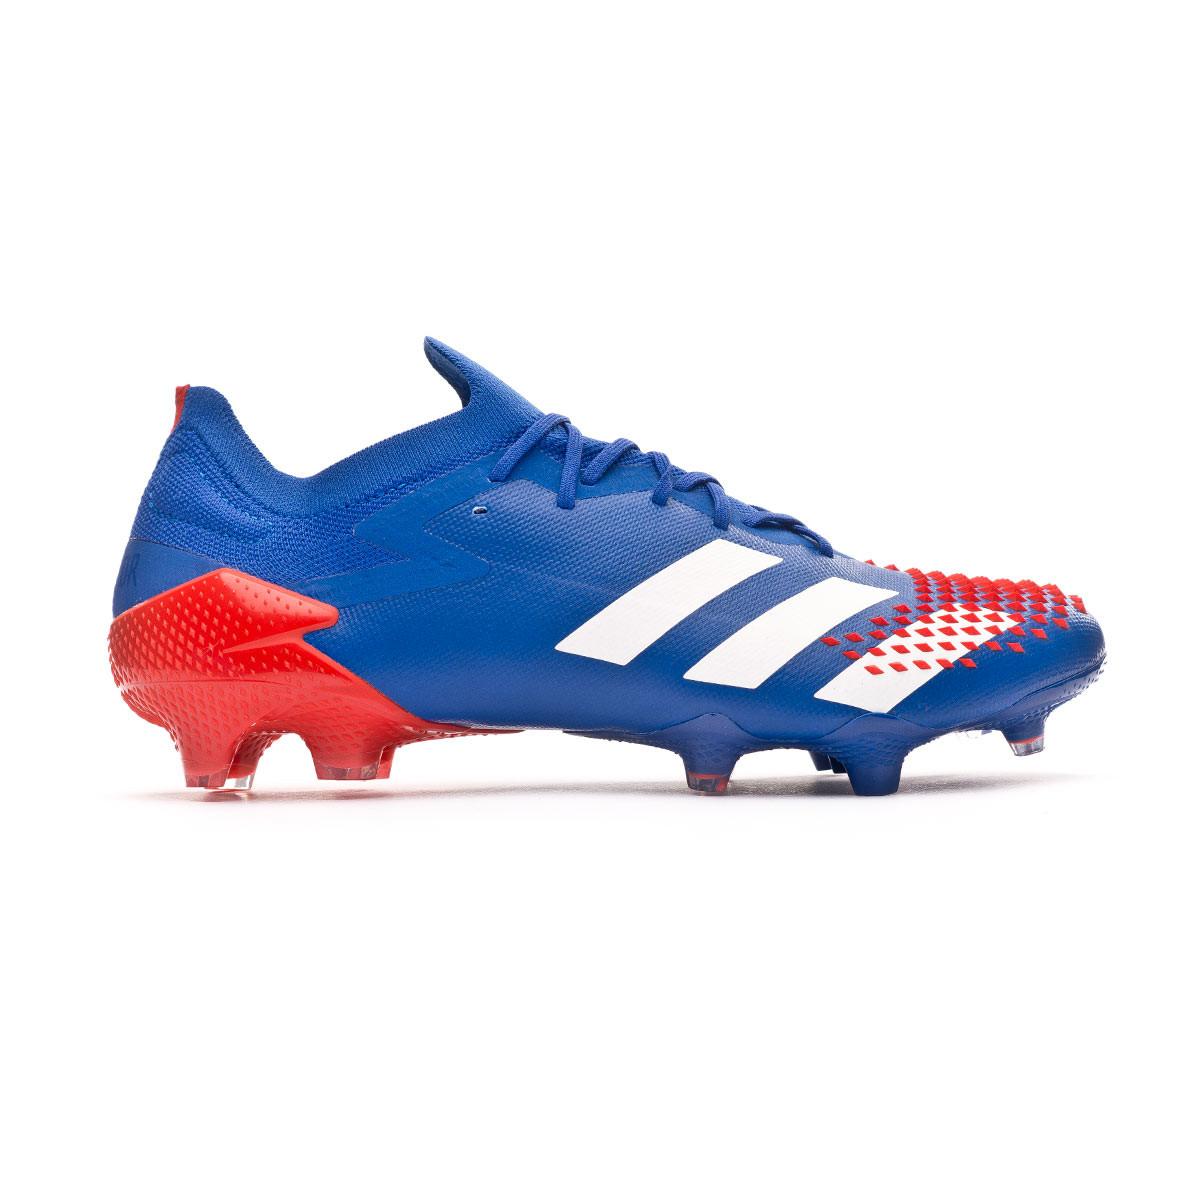 Football Boots adidas Predator 20.1 Low